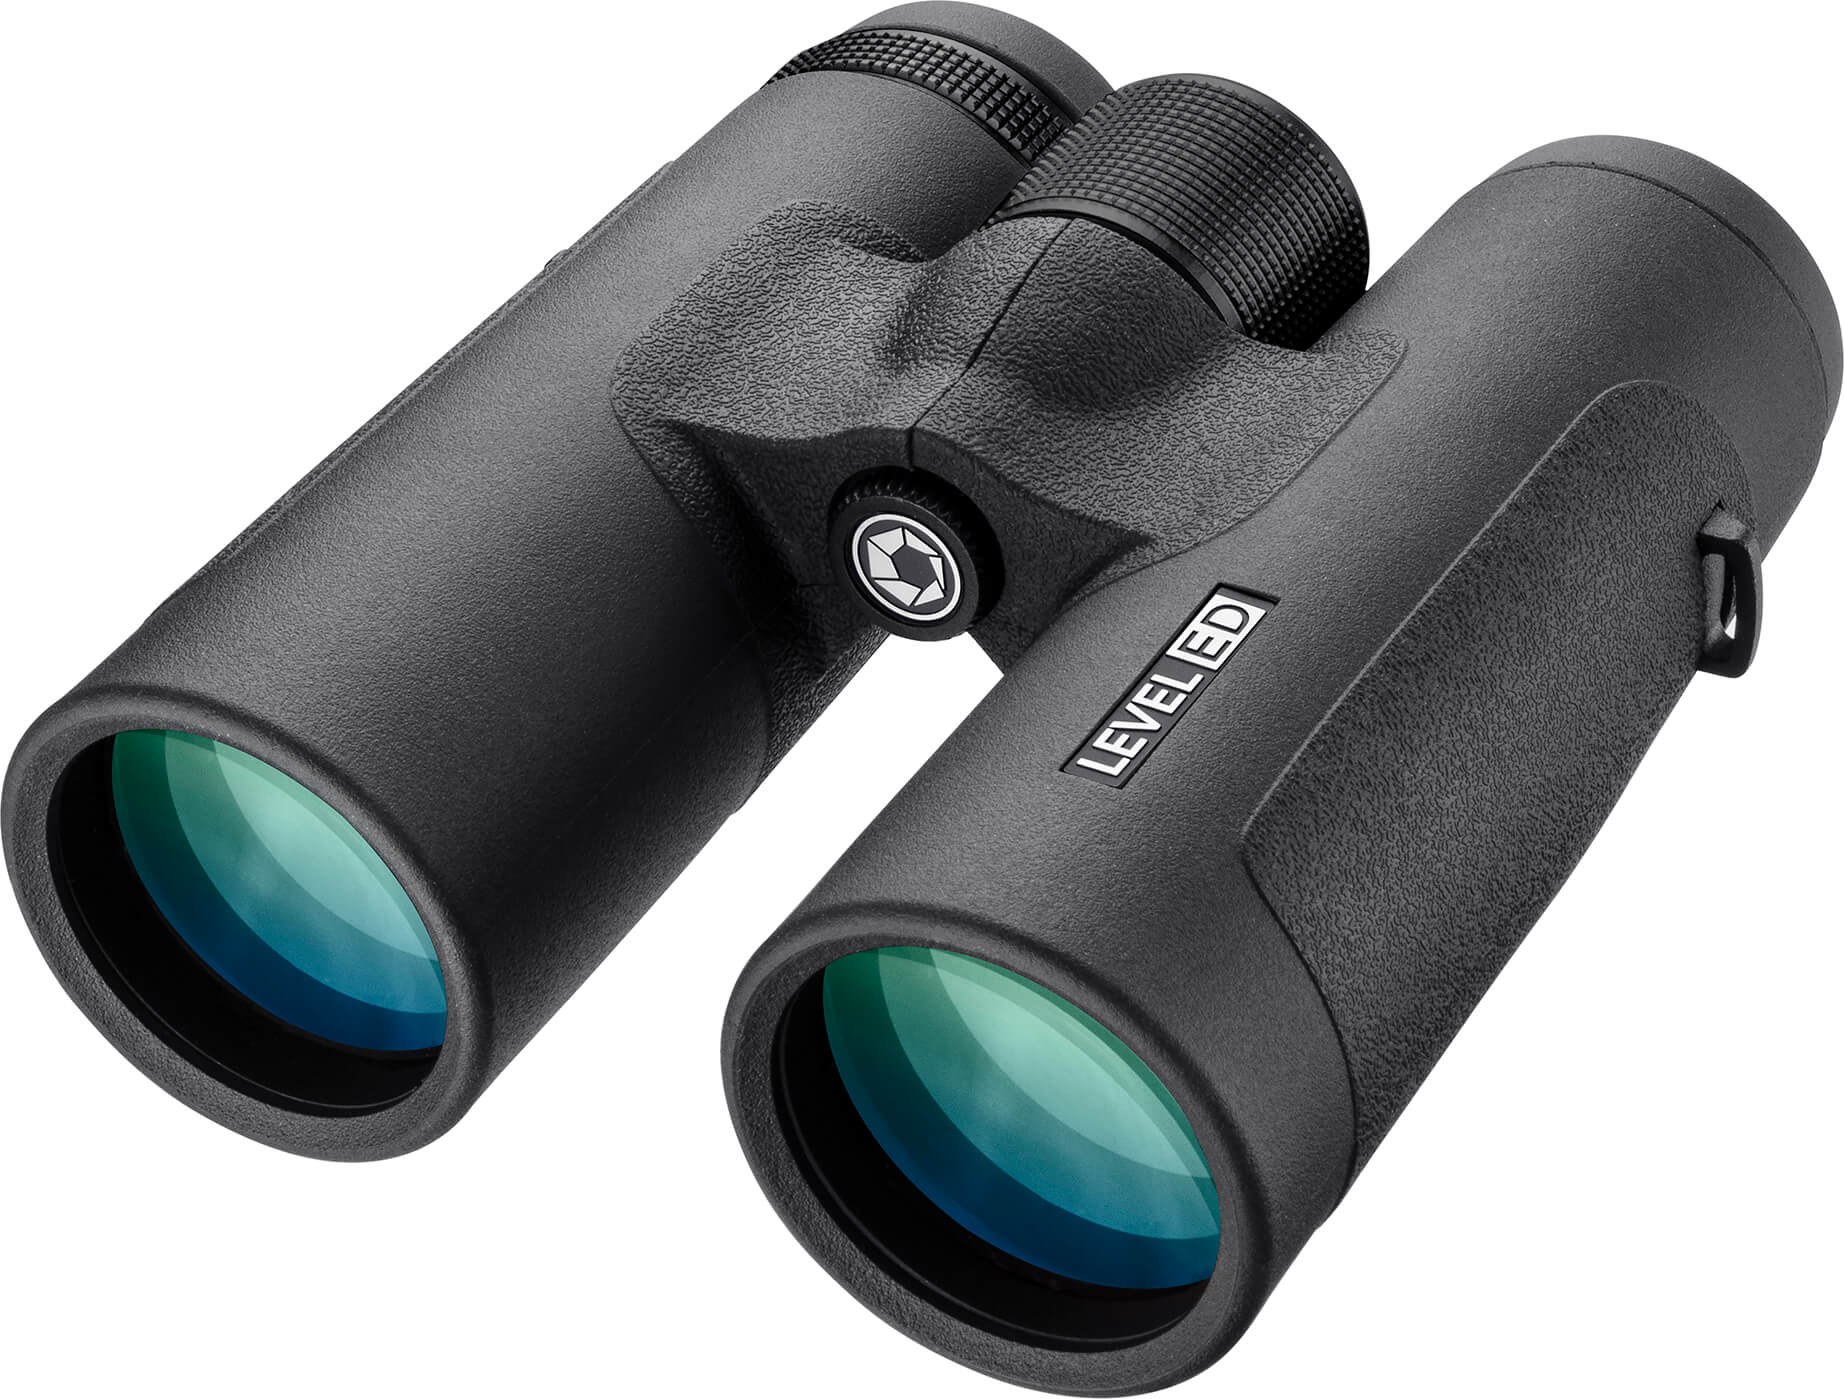 10x42mm WP LEVEL ED Binoculars